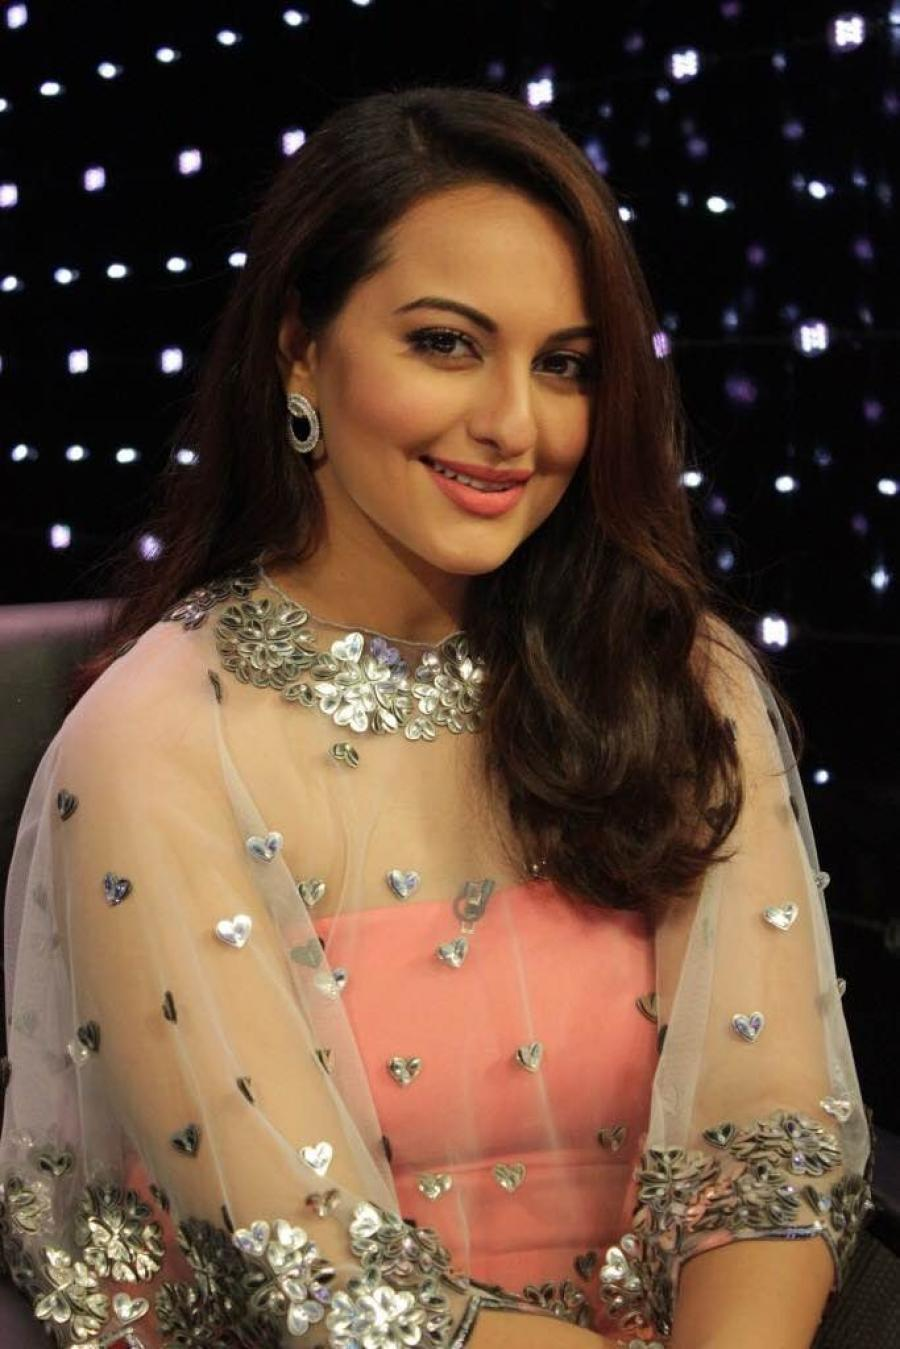 Model Sonakshi Sinha At Film Promotion In Pink Dress